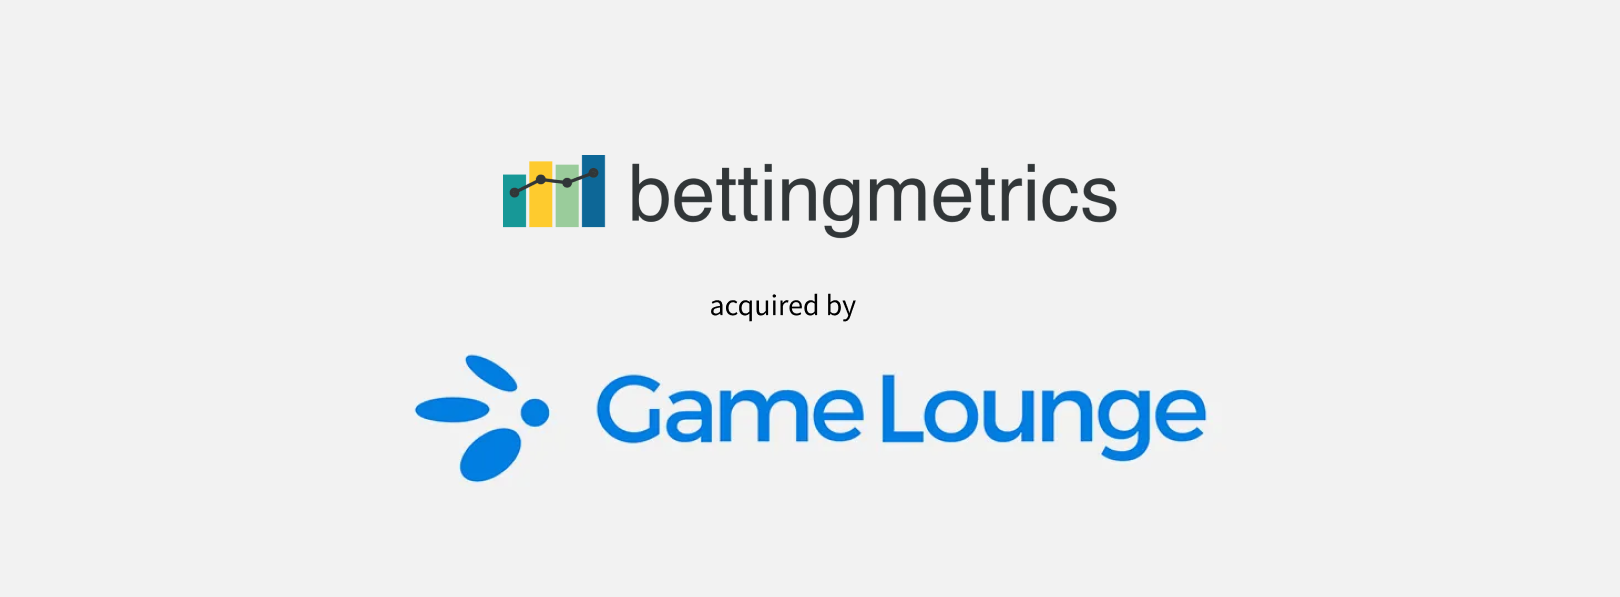 RLC Ventures Portfolio Company Bettingmetrics Acquired